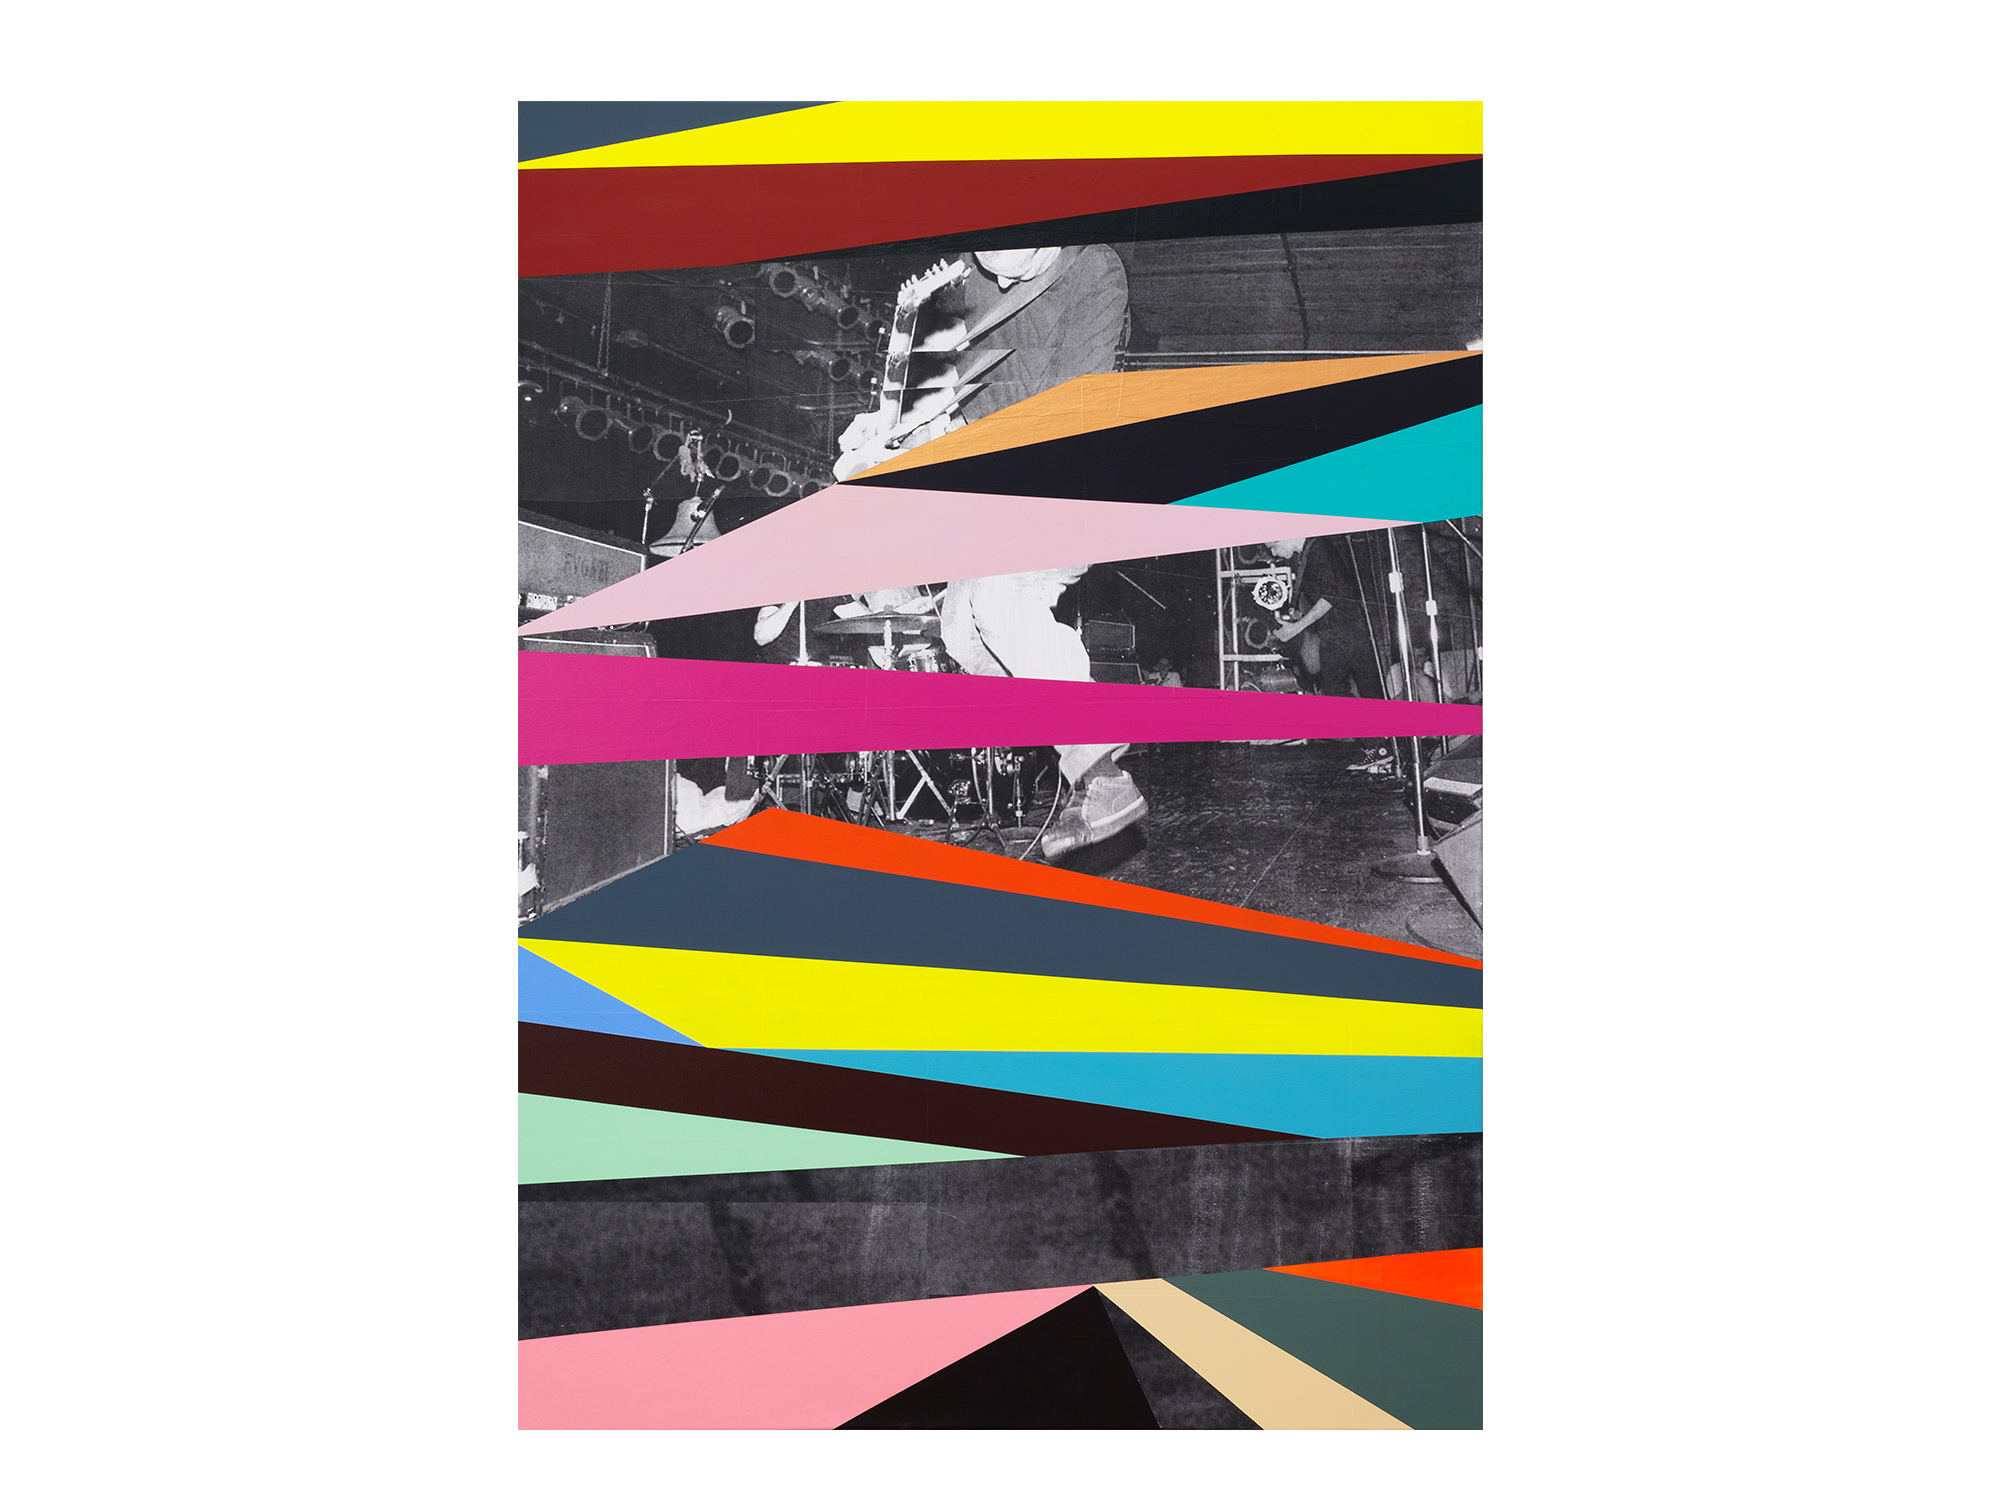 Kyle Jenkins   Position Point (Margin Walker) #74 , 2017 acrylic and paper on canvas 122 x 91 cm   ARTIST BIO